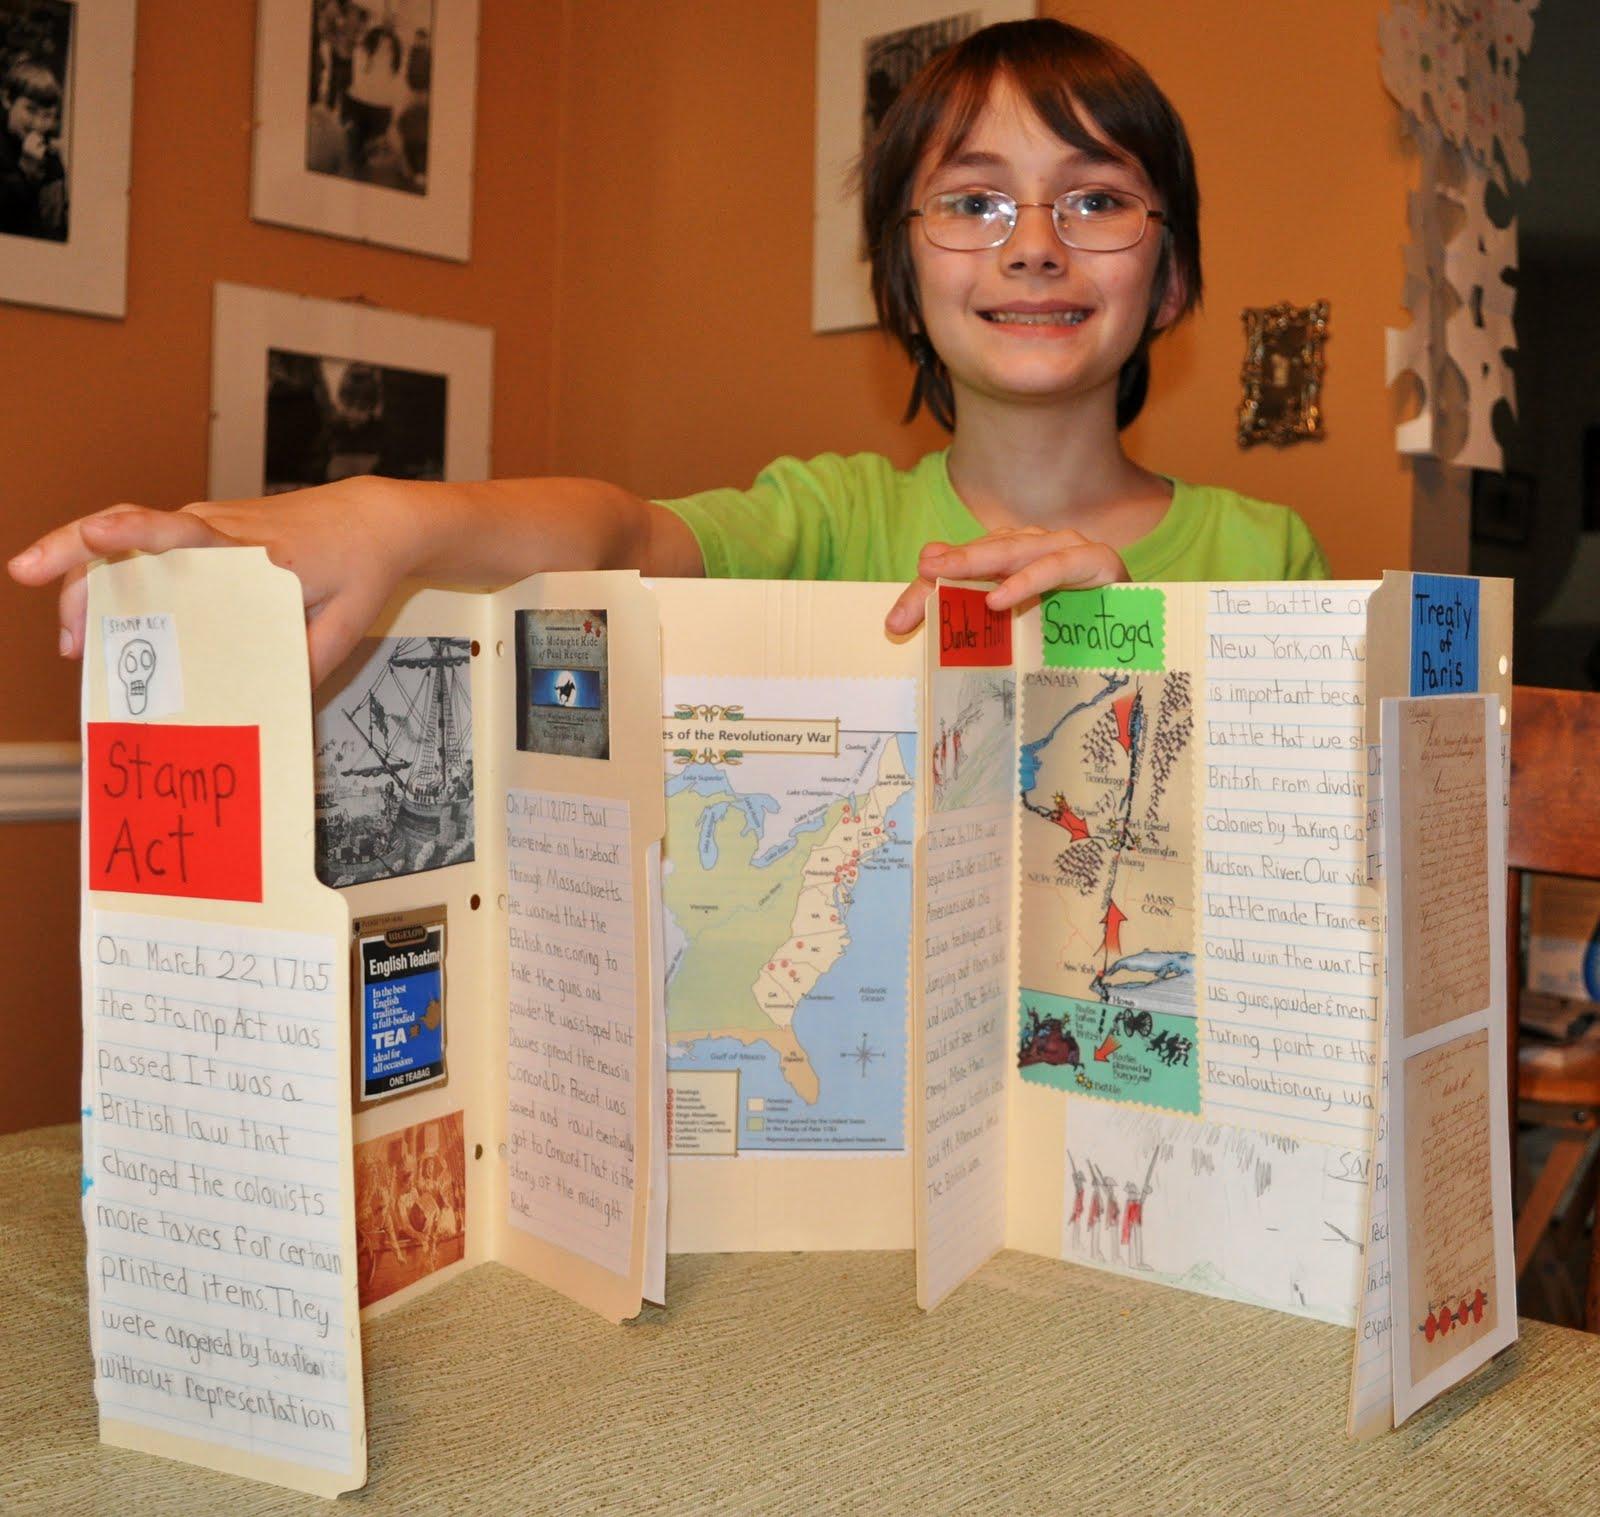 Cami S School At Home Revolutionary War Lapbook